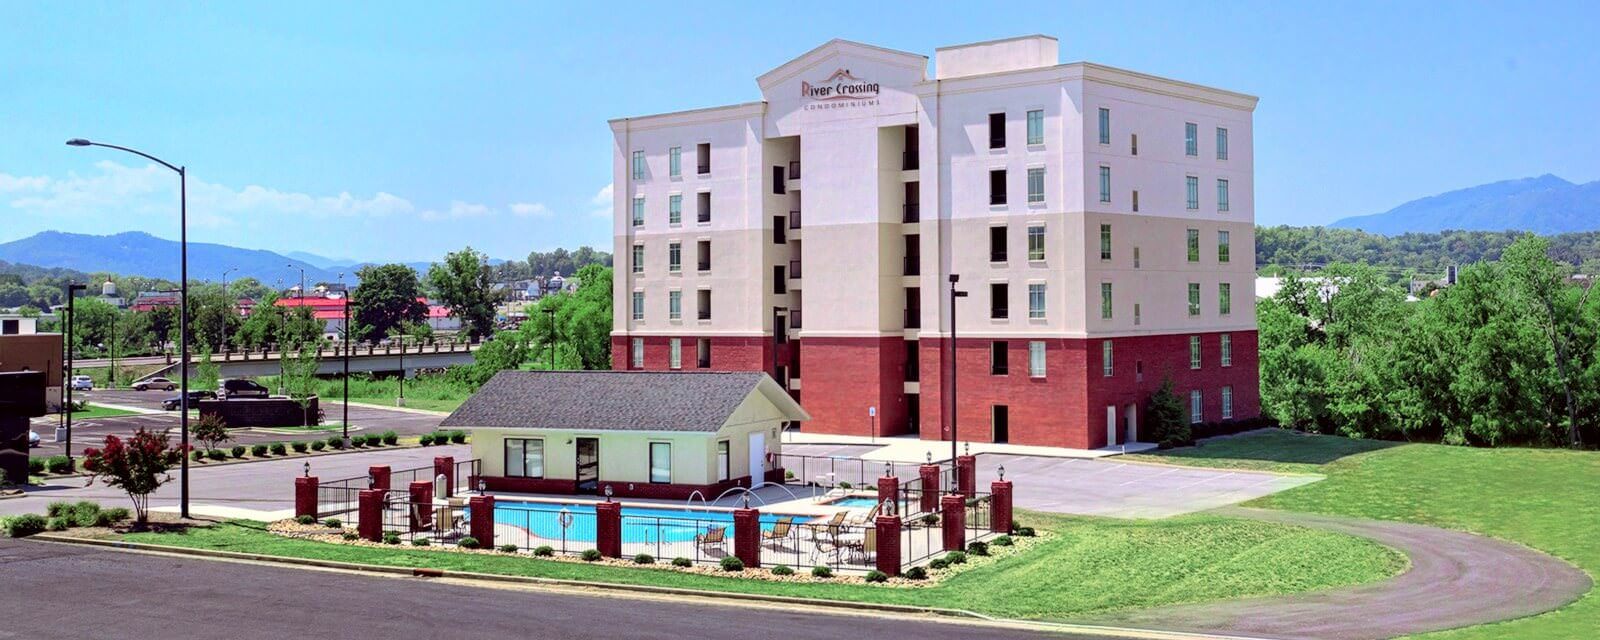 river crossing comdominiums